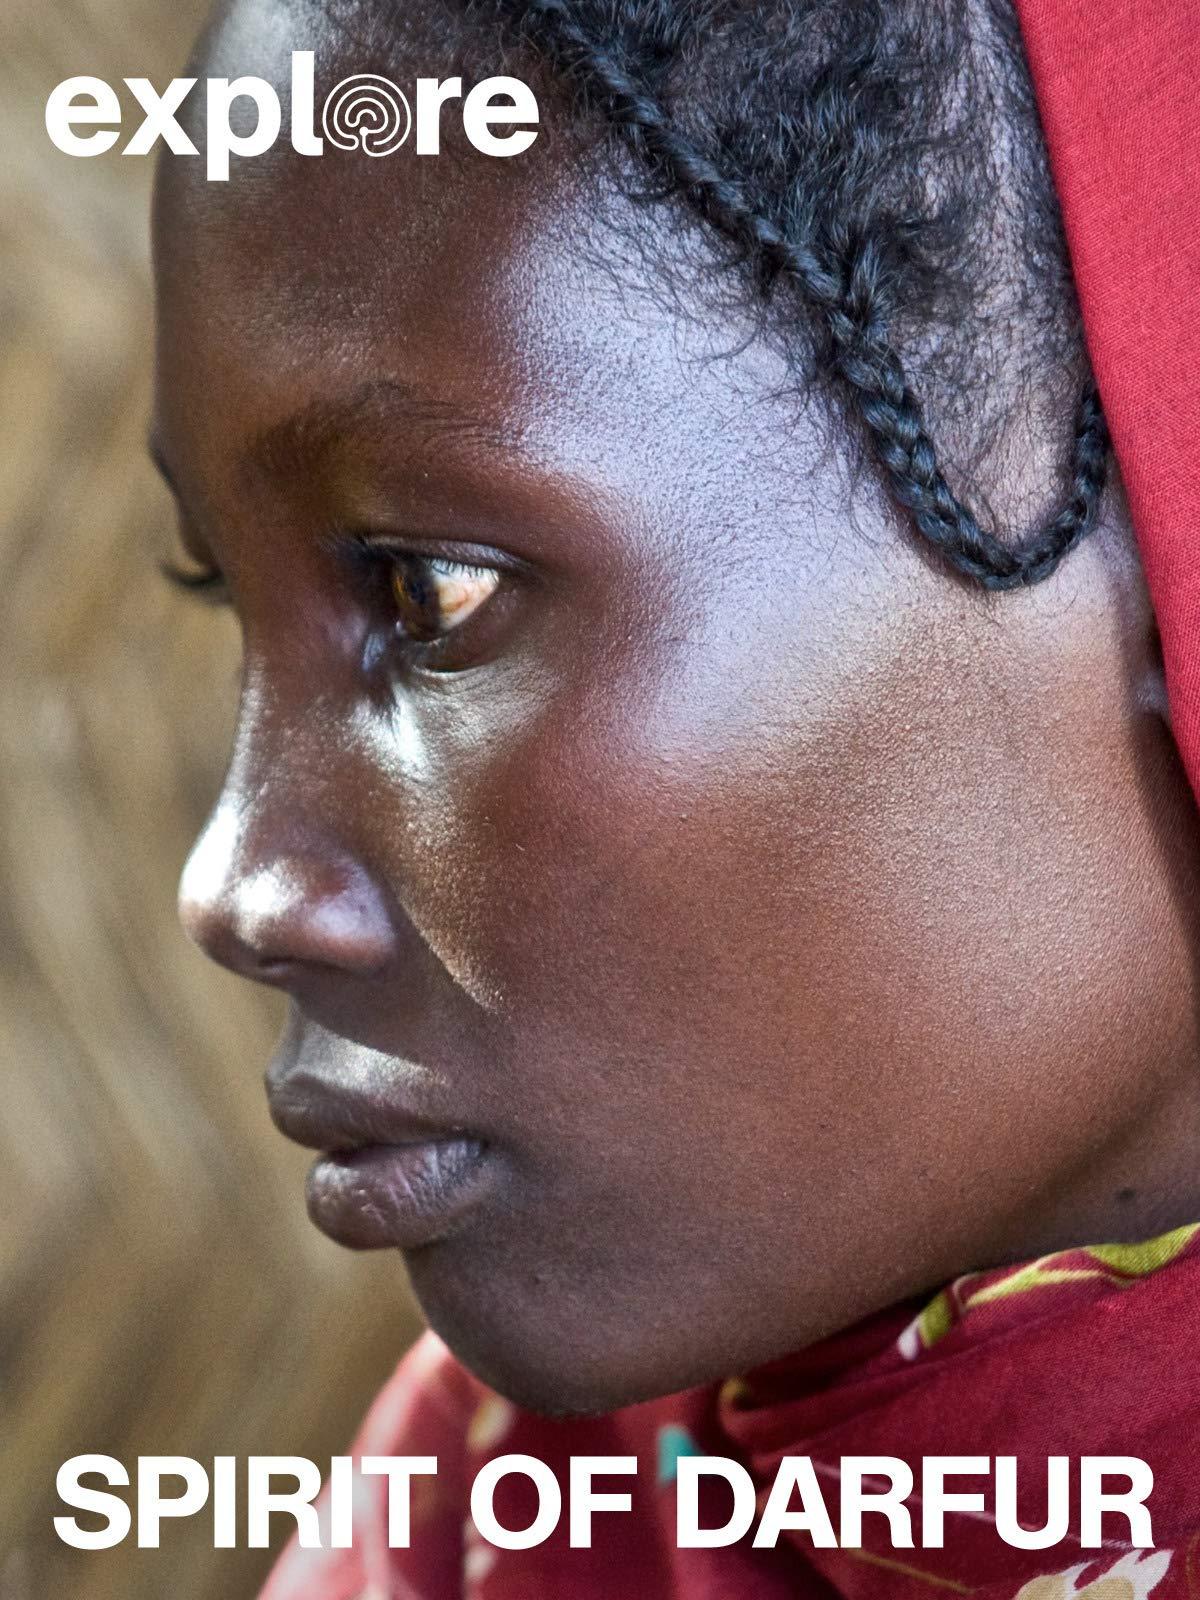 Spirit of Darfur